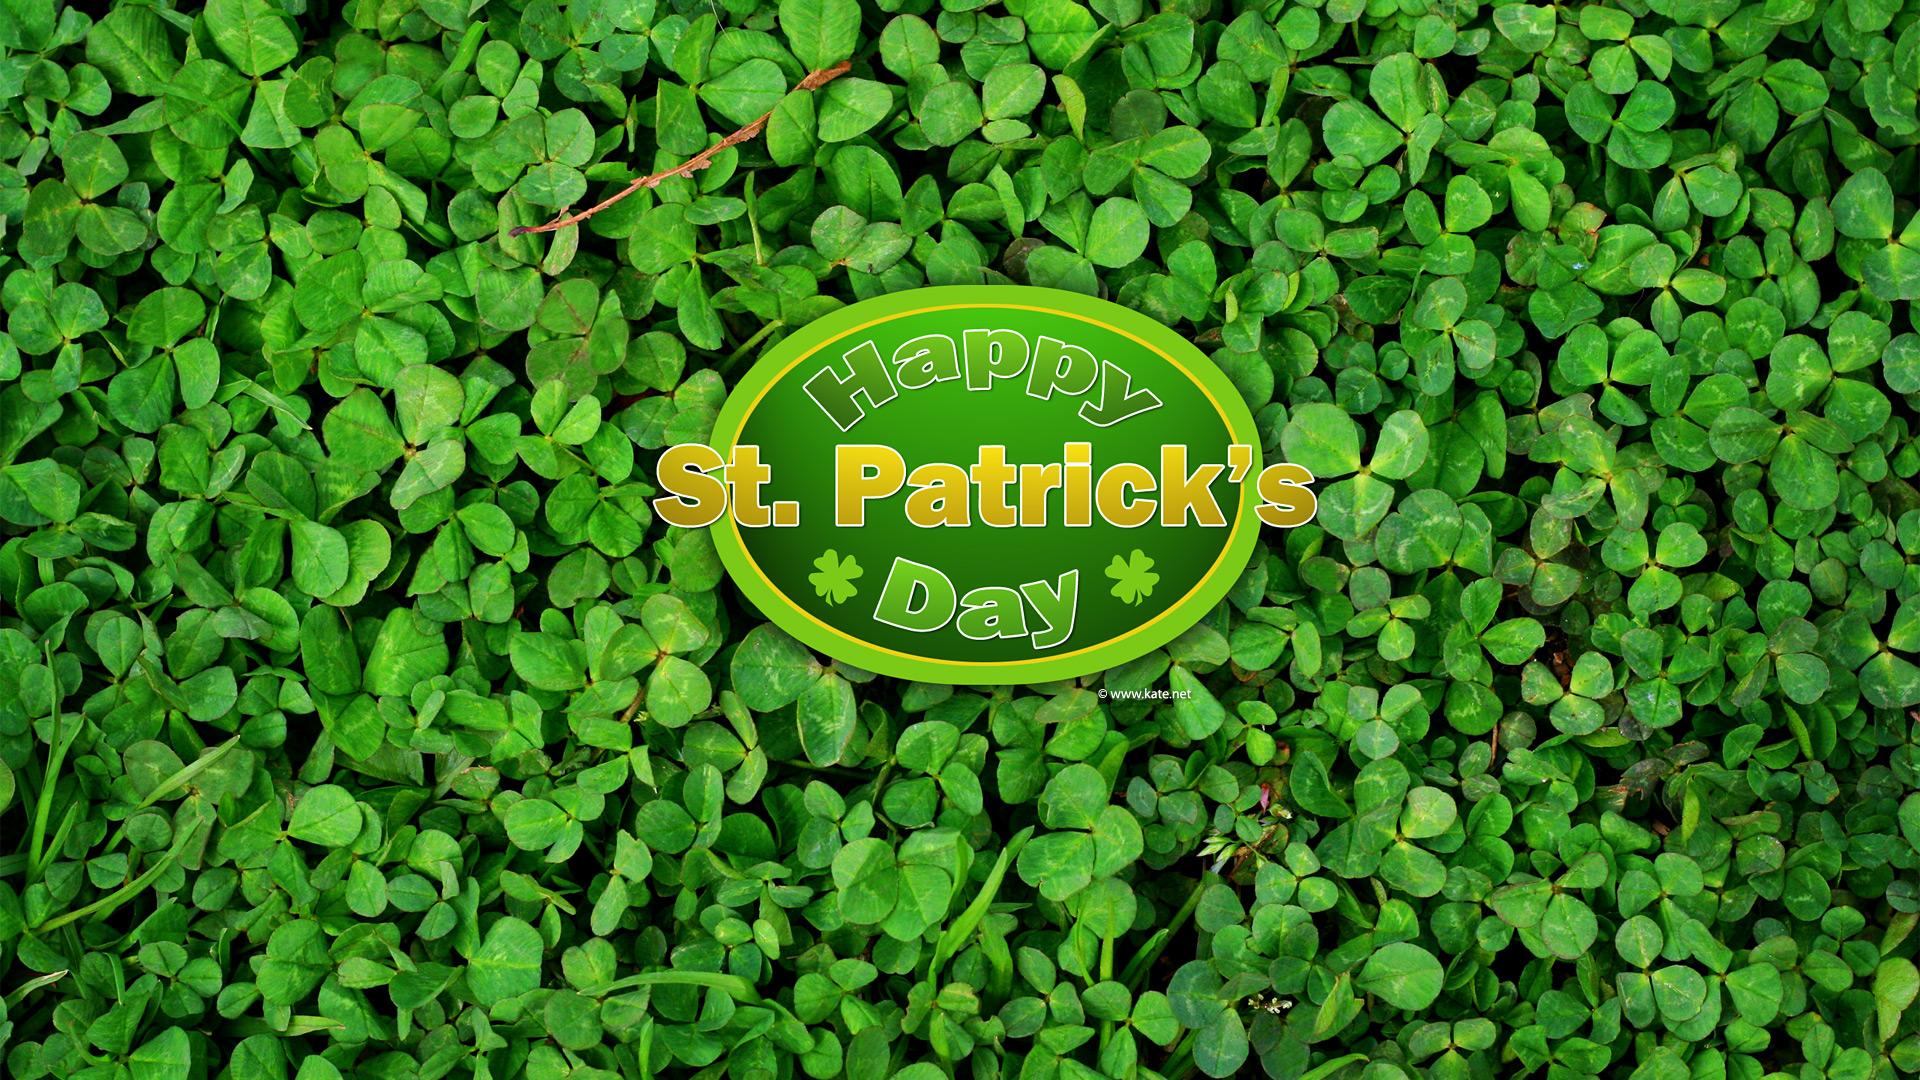 st Patricks Day Wallpaper images 1920x1080